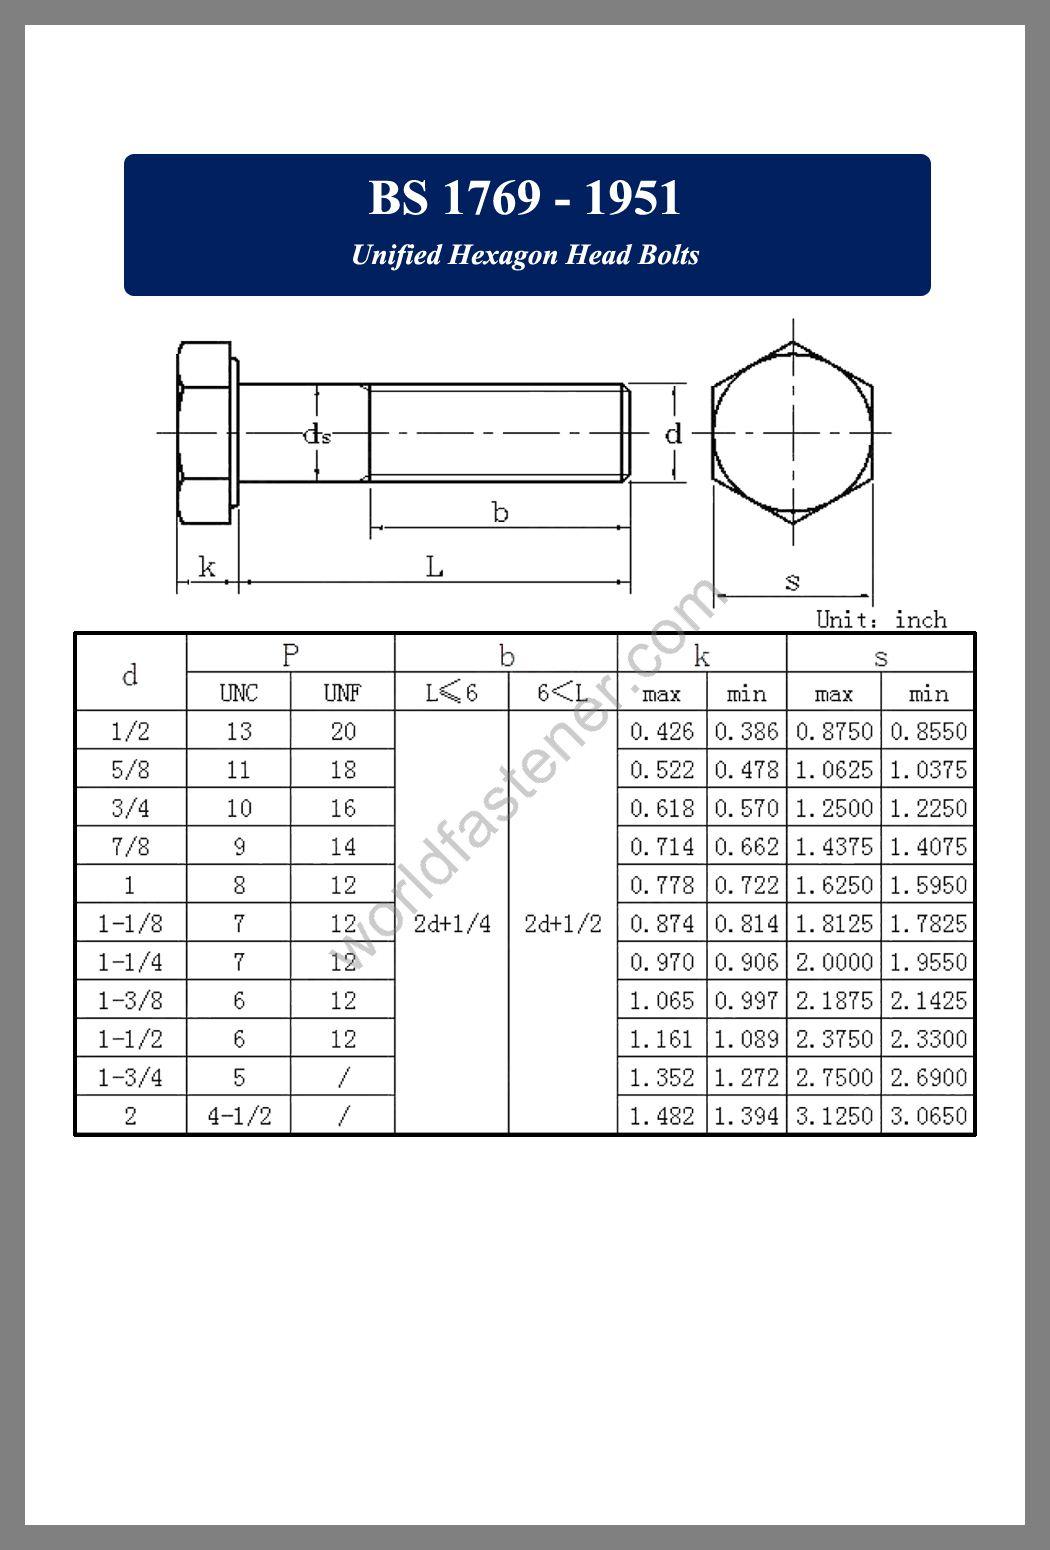 BS 1769, BS 1769 Unified Hexagon Head Bolts, fastener, screw, bolt, BS Bolt, BS fastener